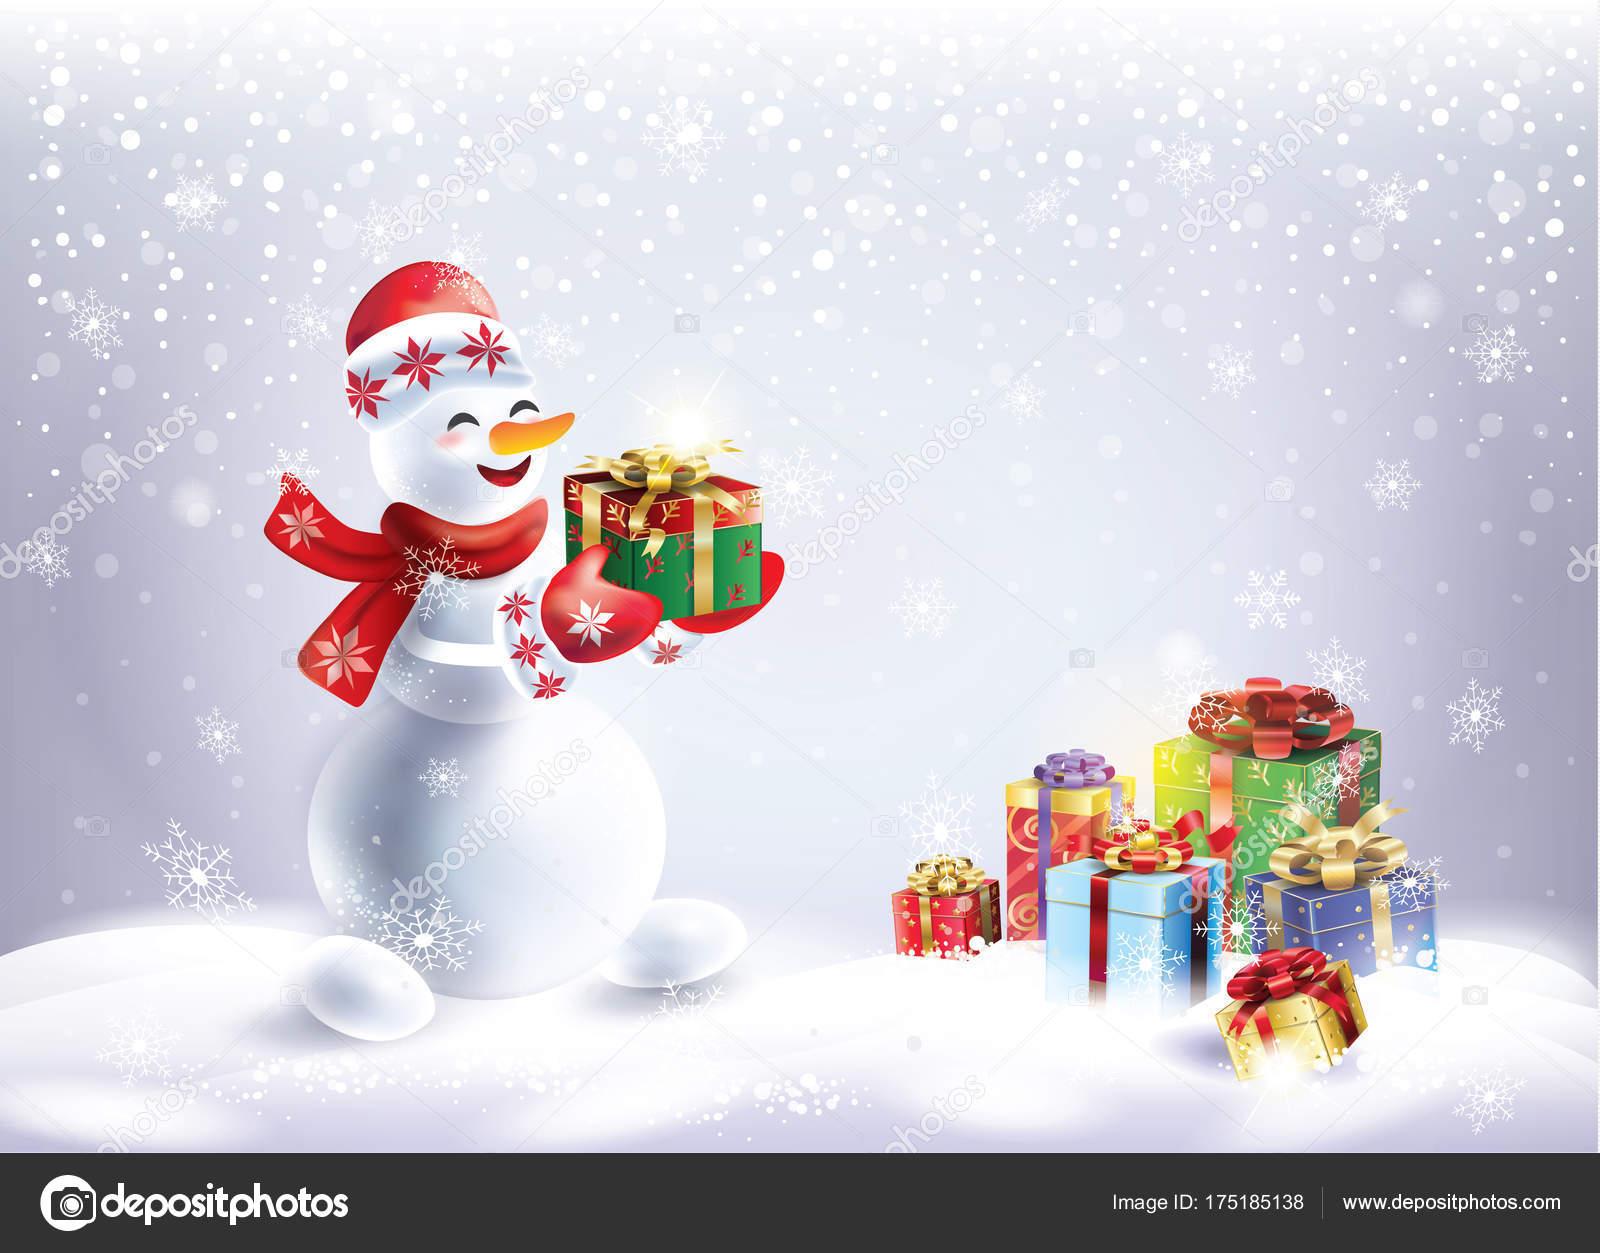 Snowman Christmas Snowy Landscape Snowman Gift Box Beautiful